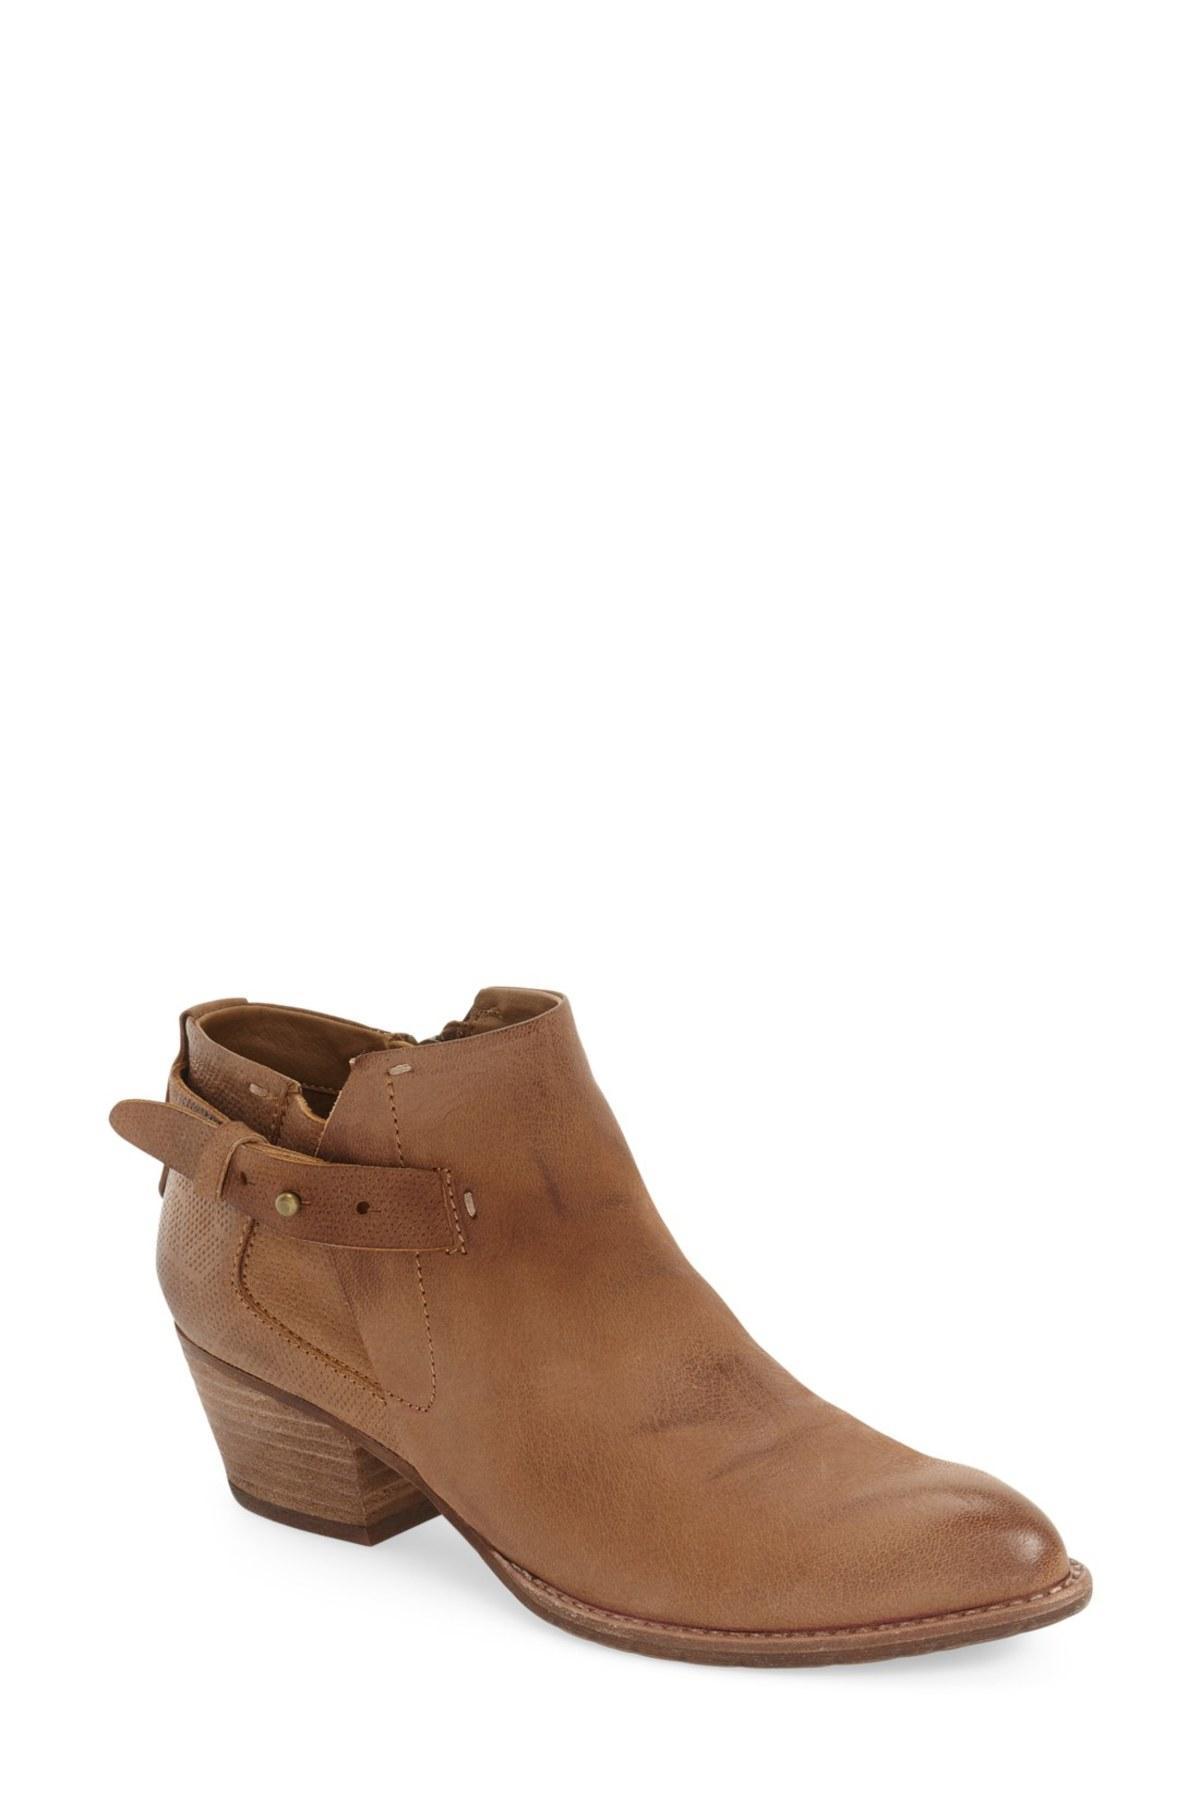 Dolce vita 'sierra' Bootie (women) in Brown   Lyst